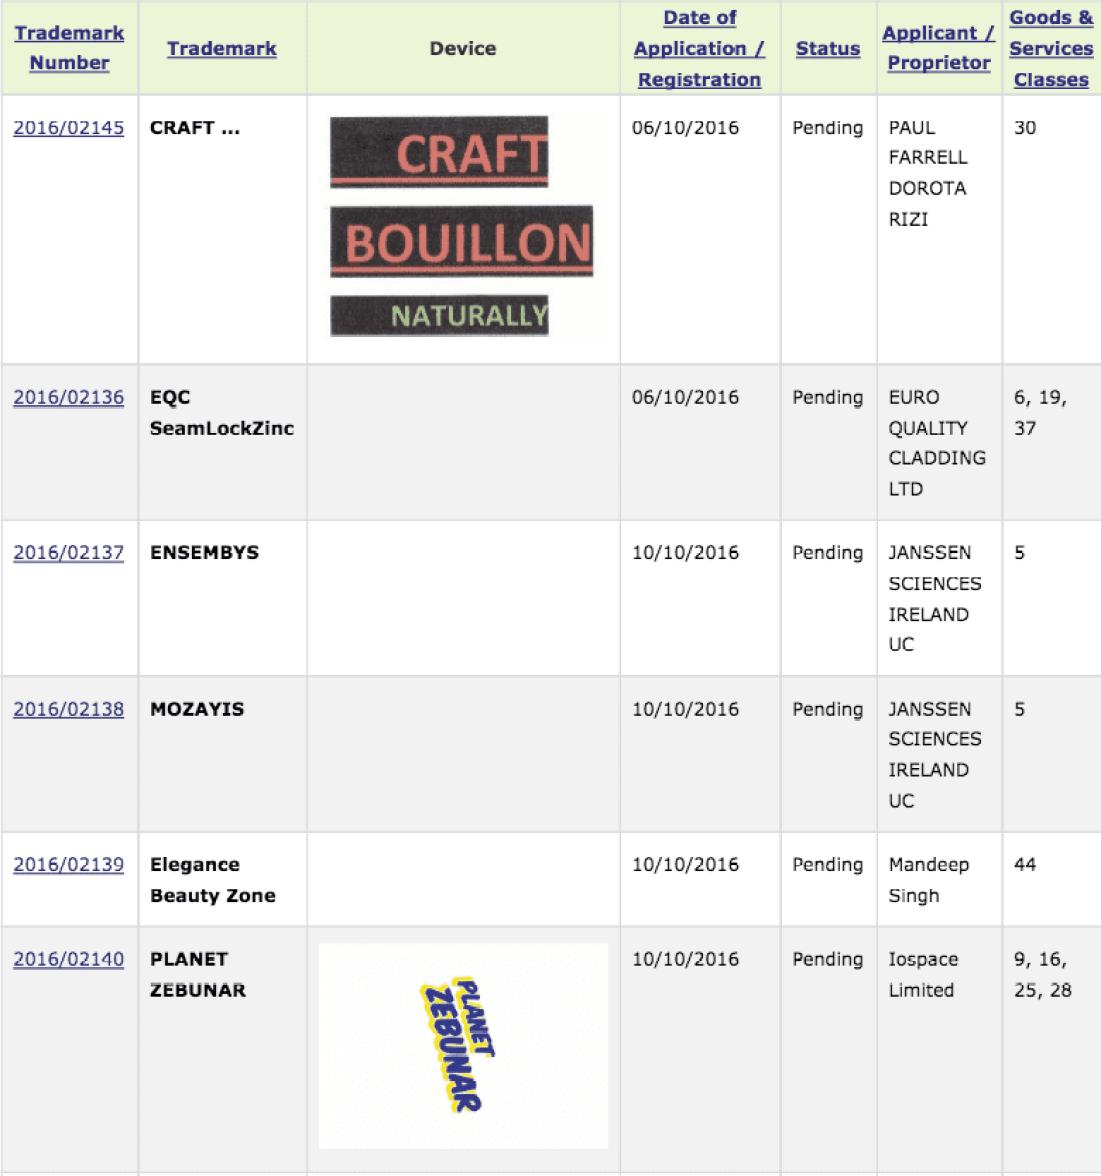 trademark-ireland-planet-zebunar-mozavis-craft-bouillon